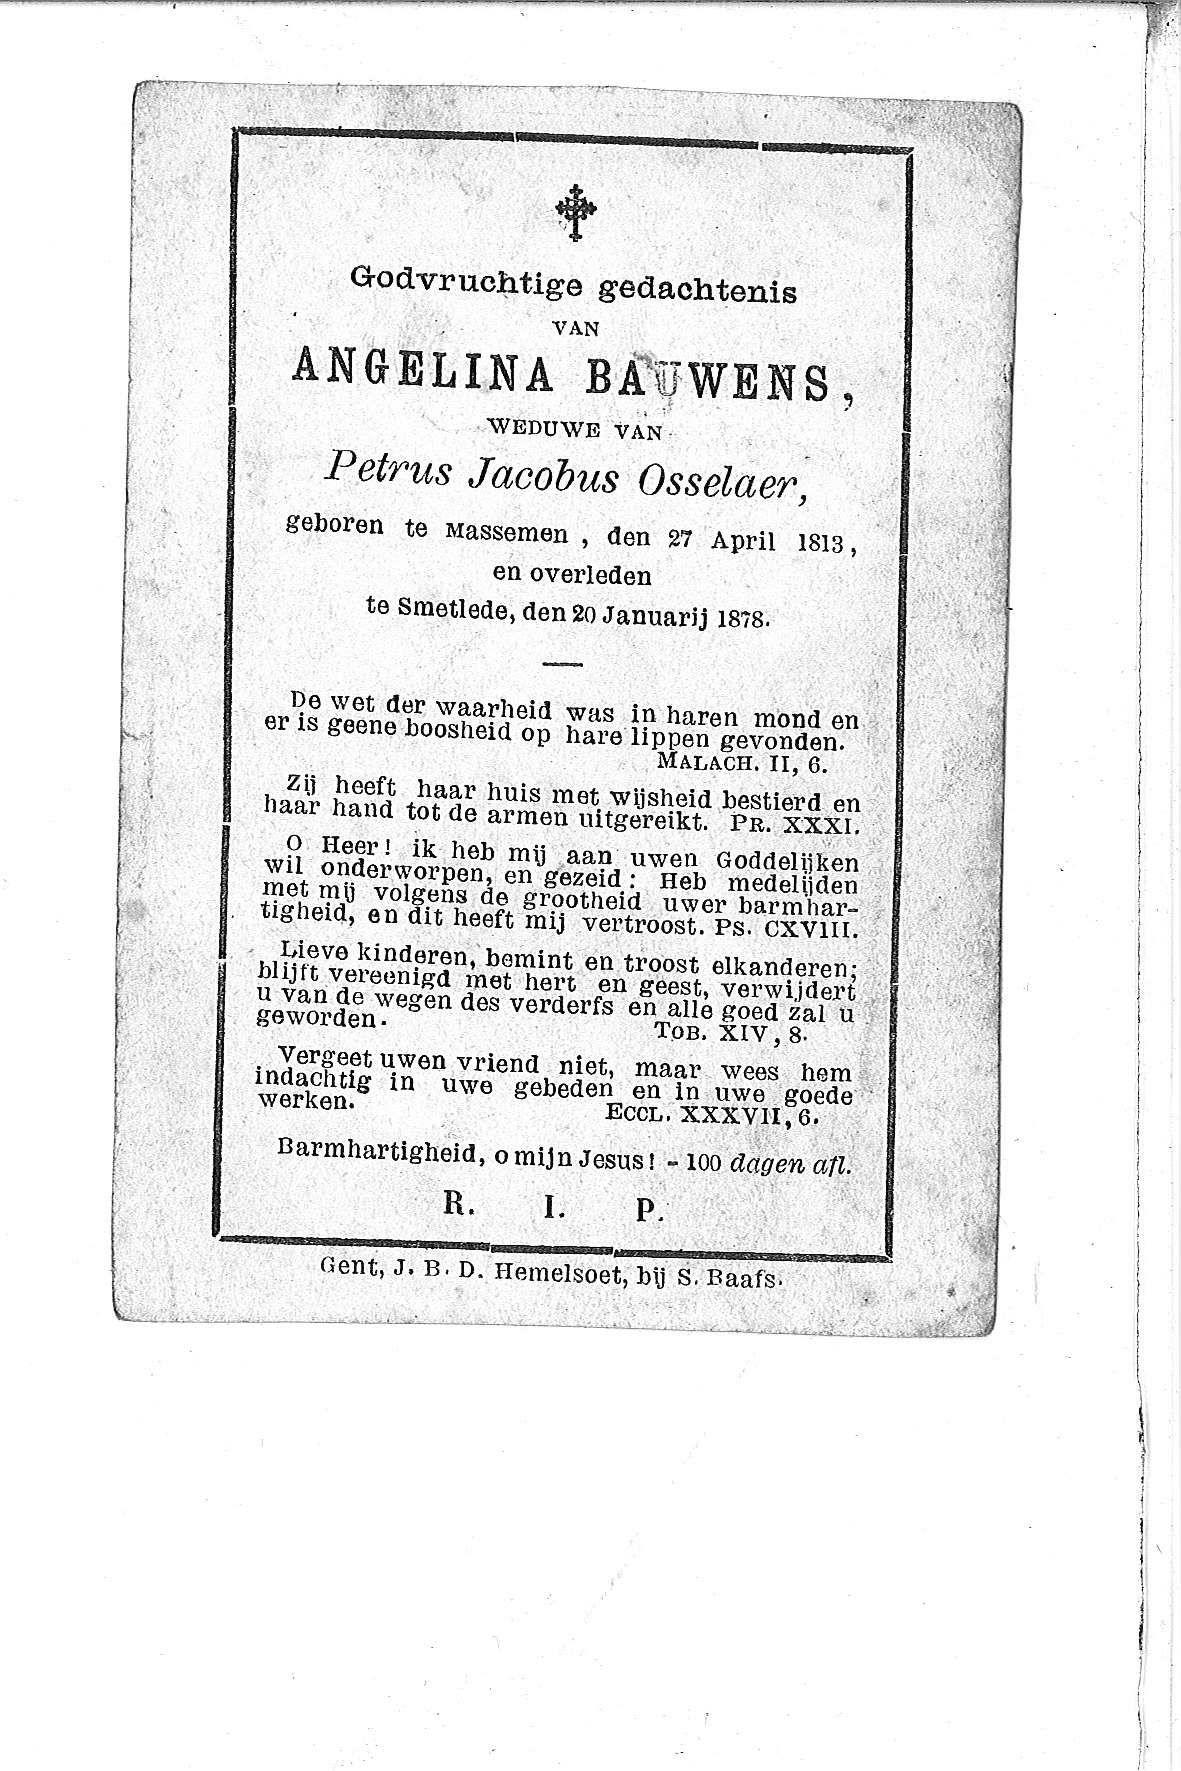 Angelina(1878)20101026093432_00009.jpg